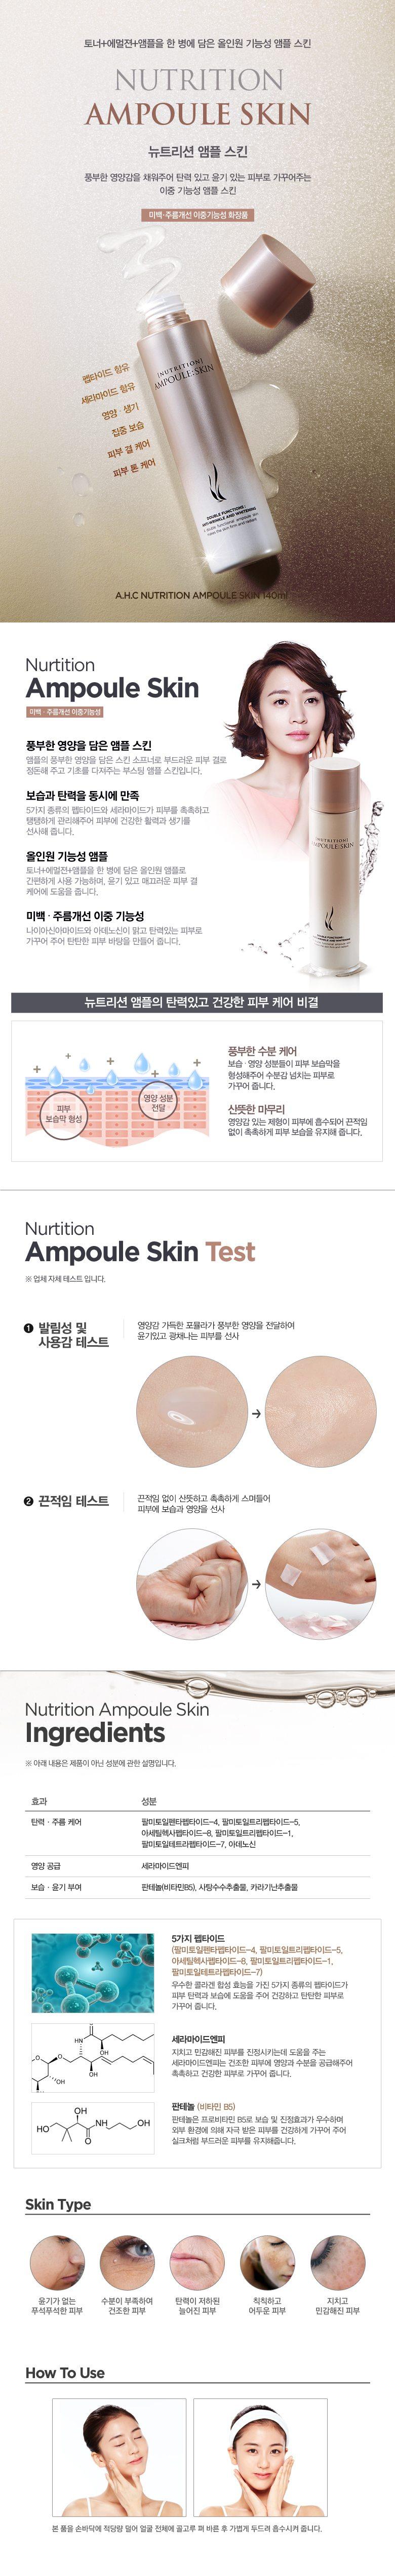 AHC Nutrition Ampoule Skin 140ml malaysia singapore indonesia